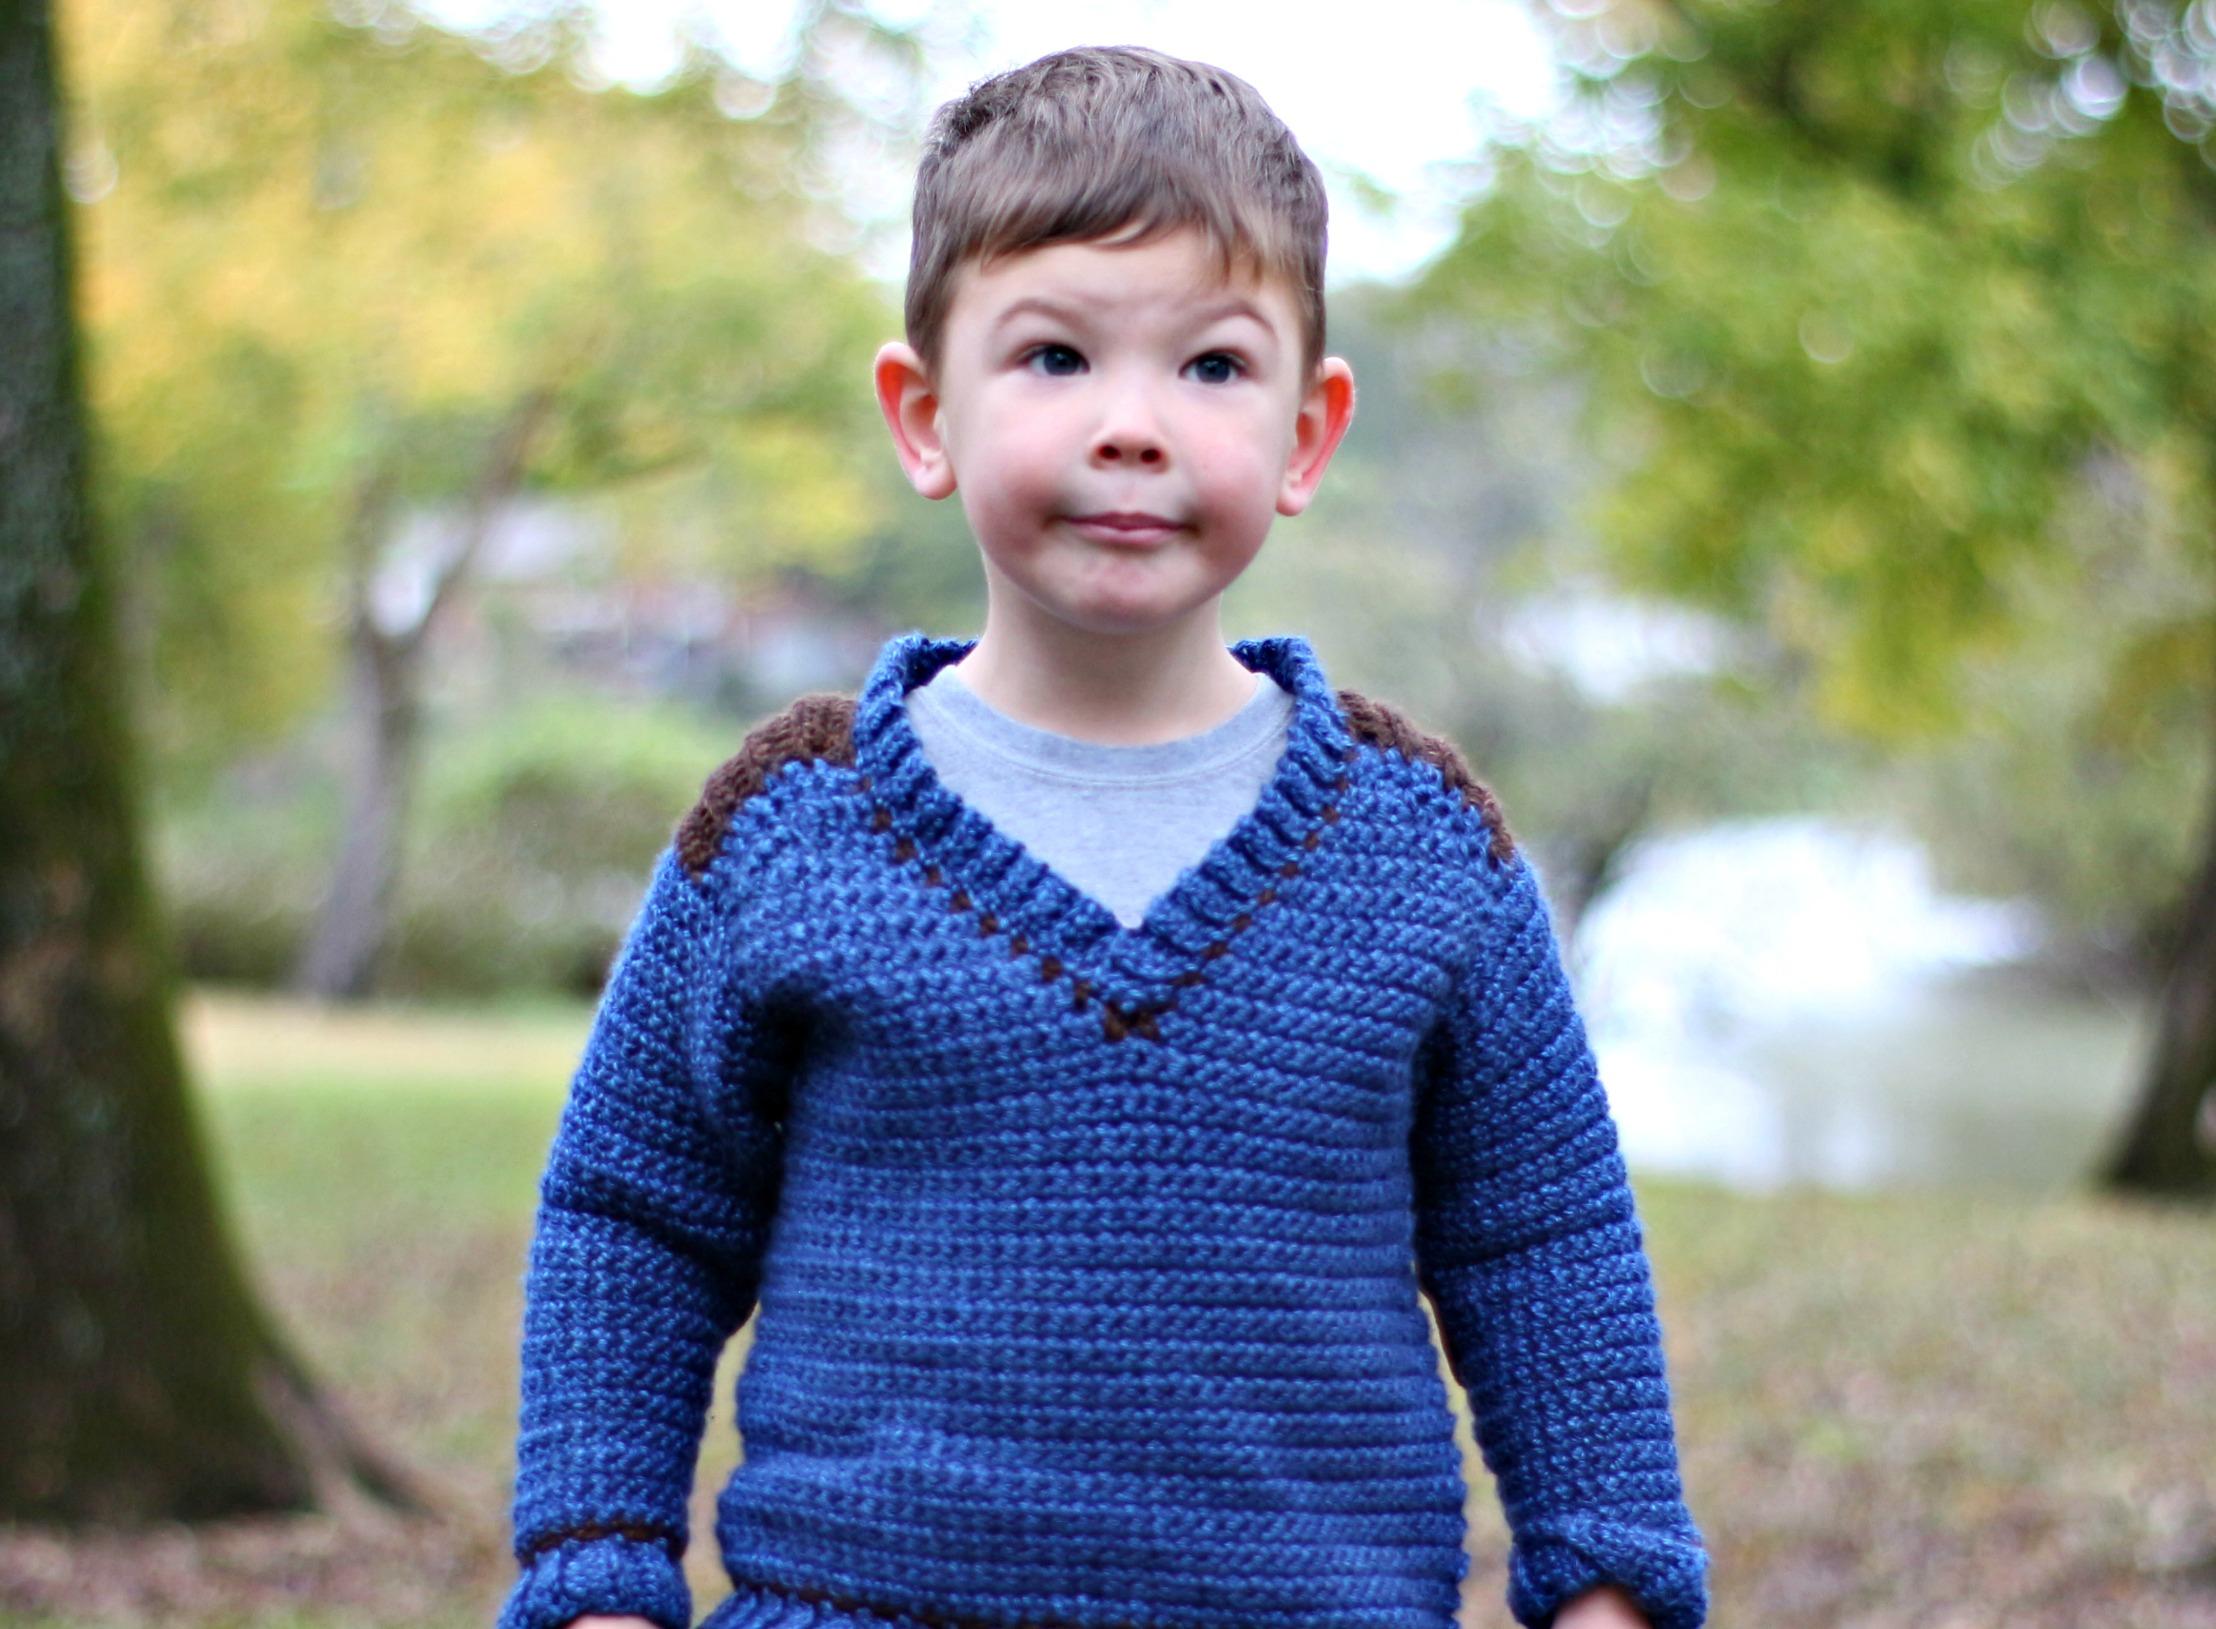 Free Crochet Jacket Pattern Designs for All Seasons Kids Saddle Shoulder Sweater Free Crochet Pattern Love Life Yarn